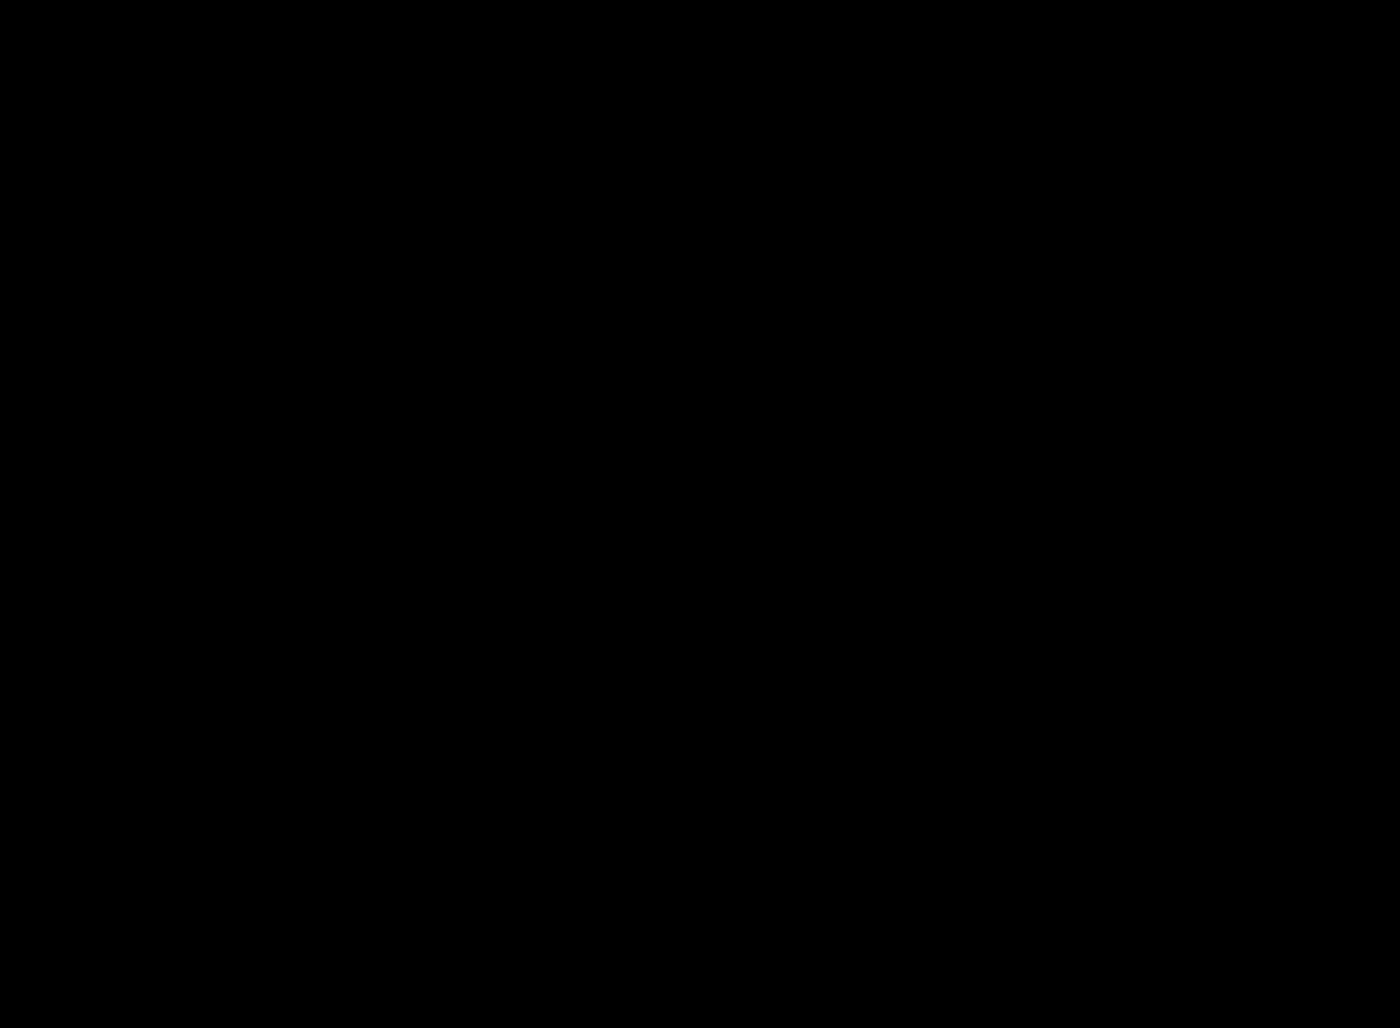 grundriss-doppelhaus-eg-energieeffizient